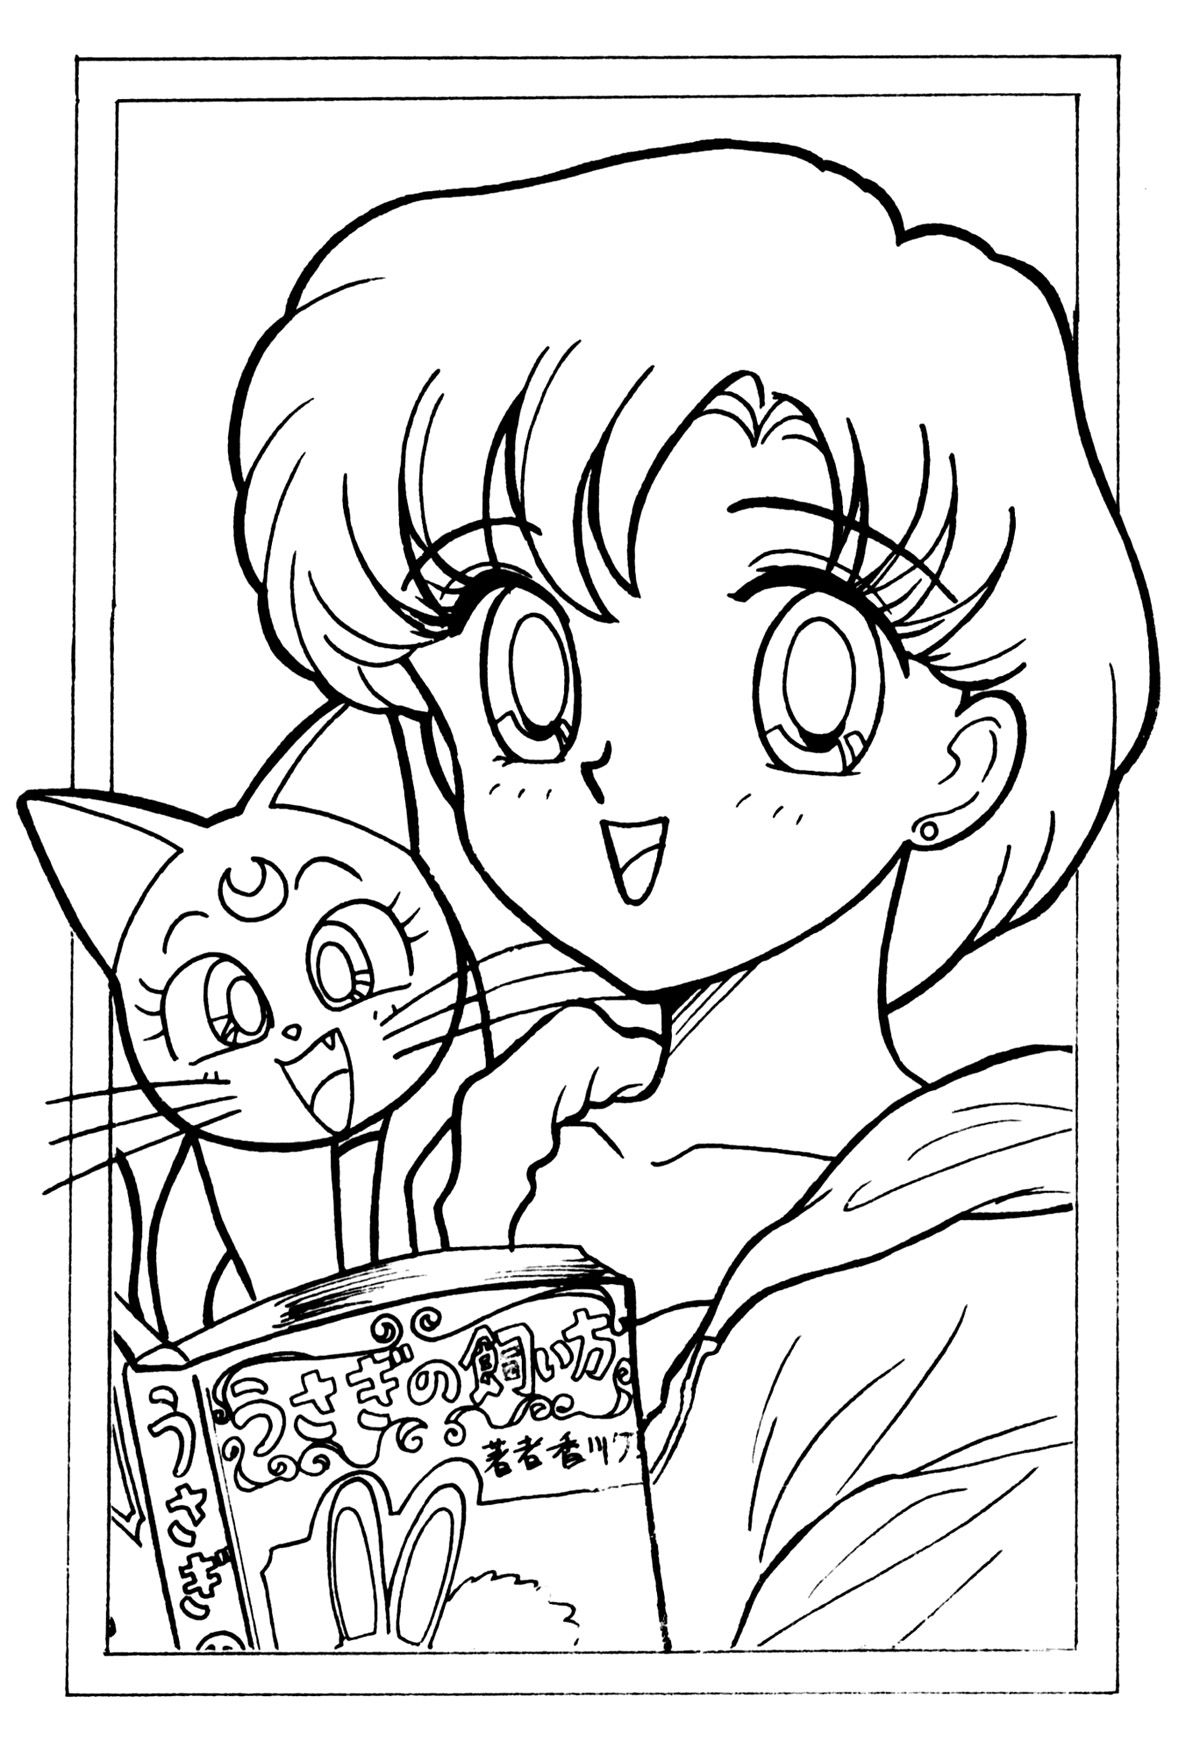 Pin by Patricia Iannone on Manga - Sailor Moon   Pinterest   Sailor